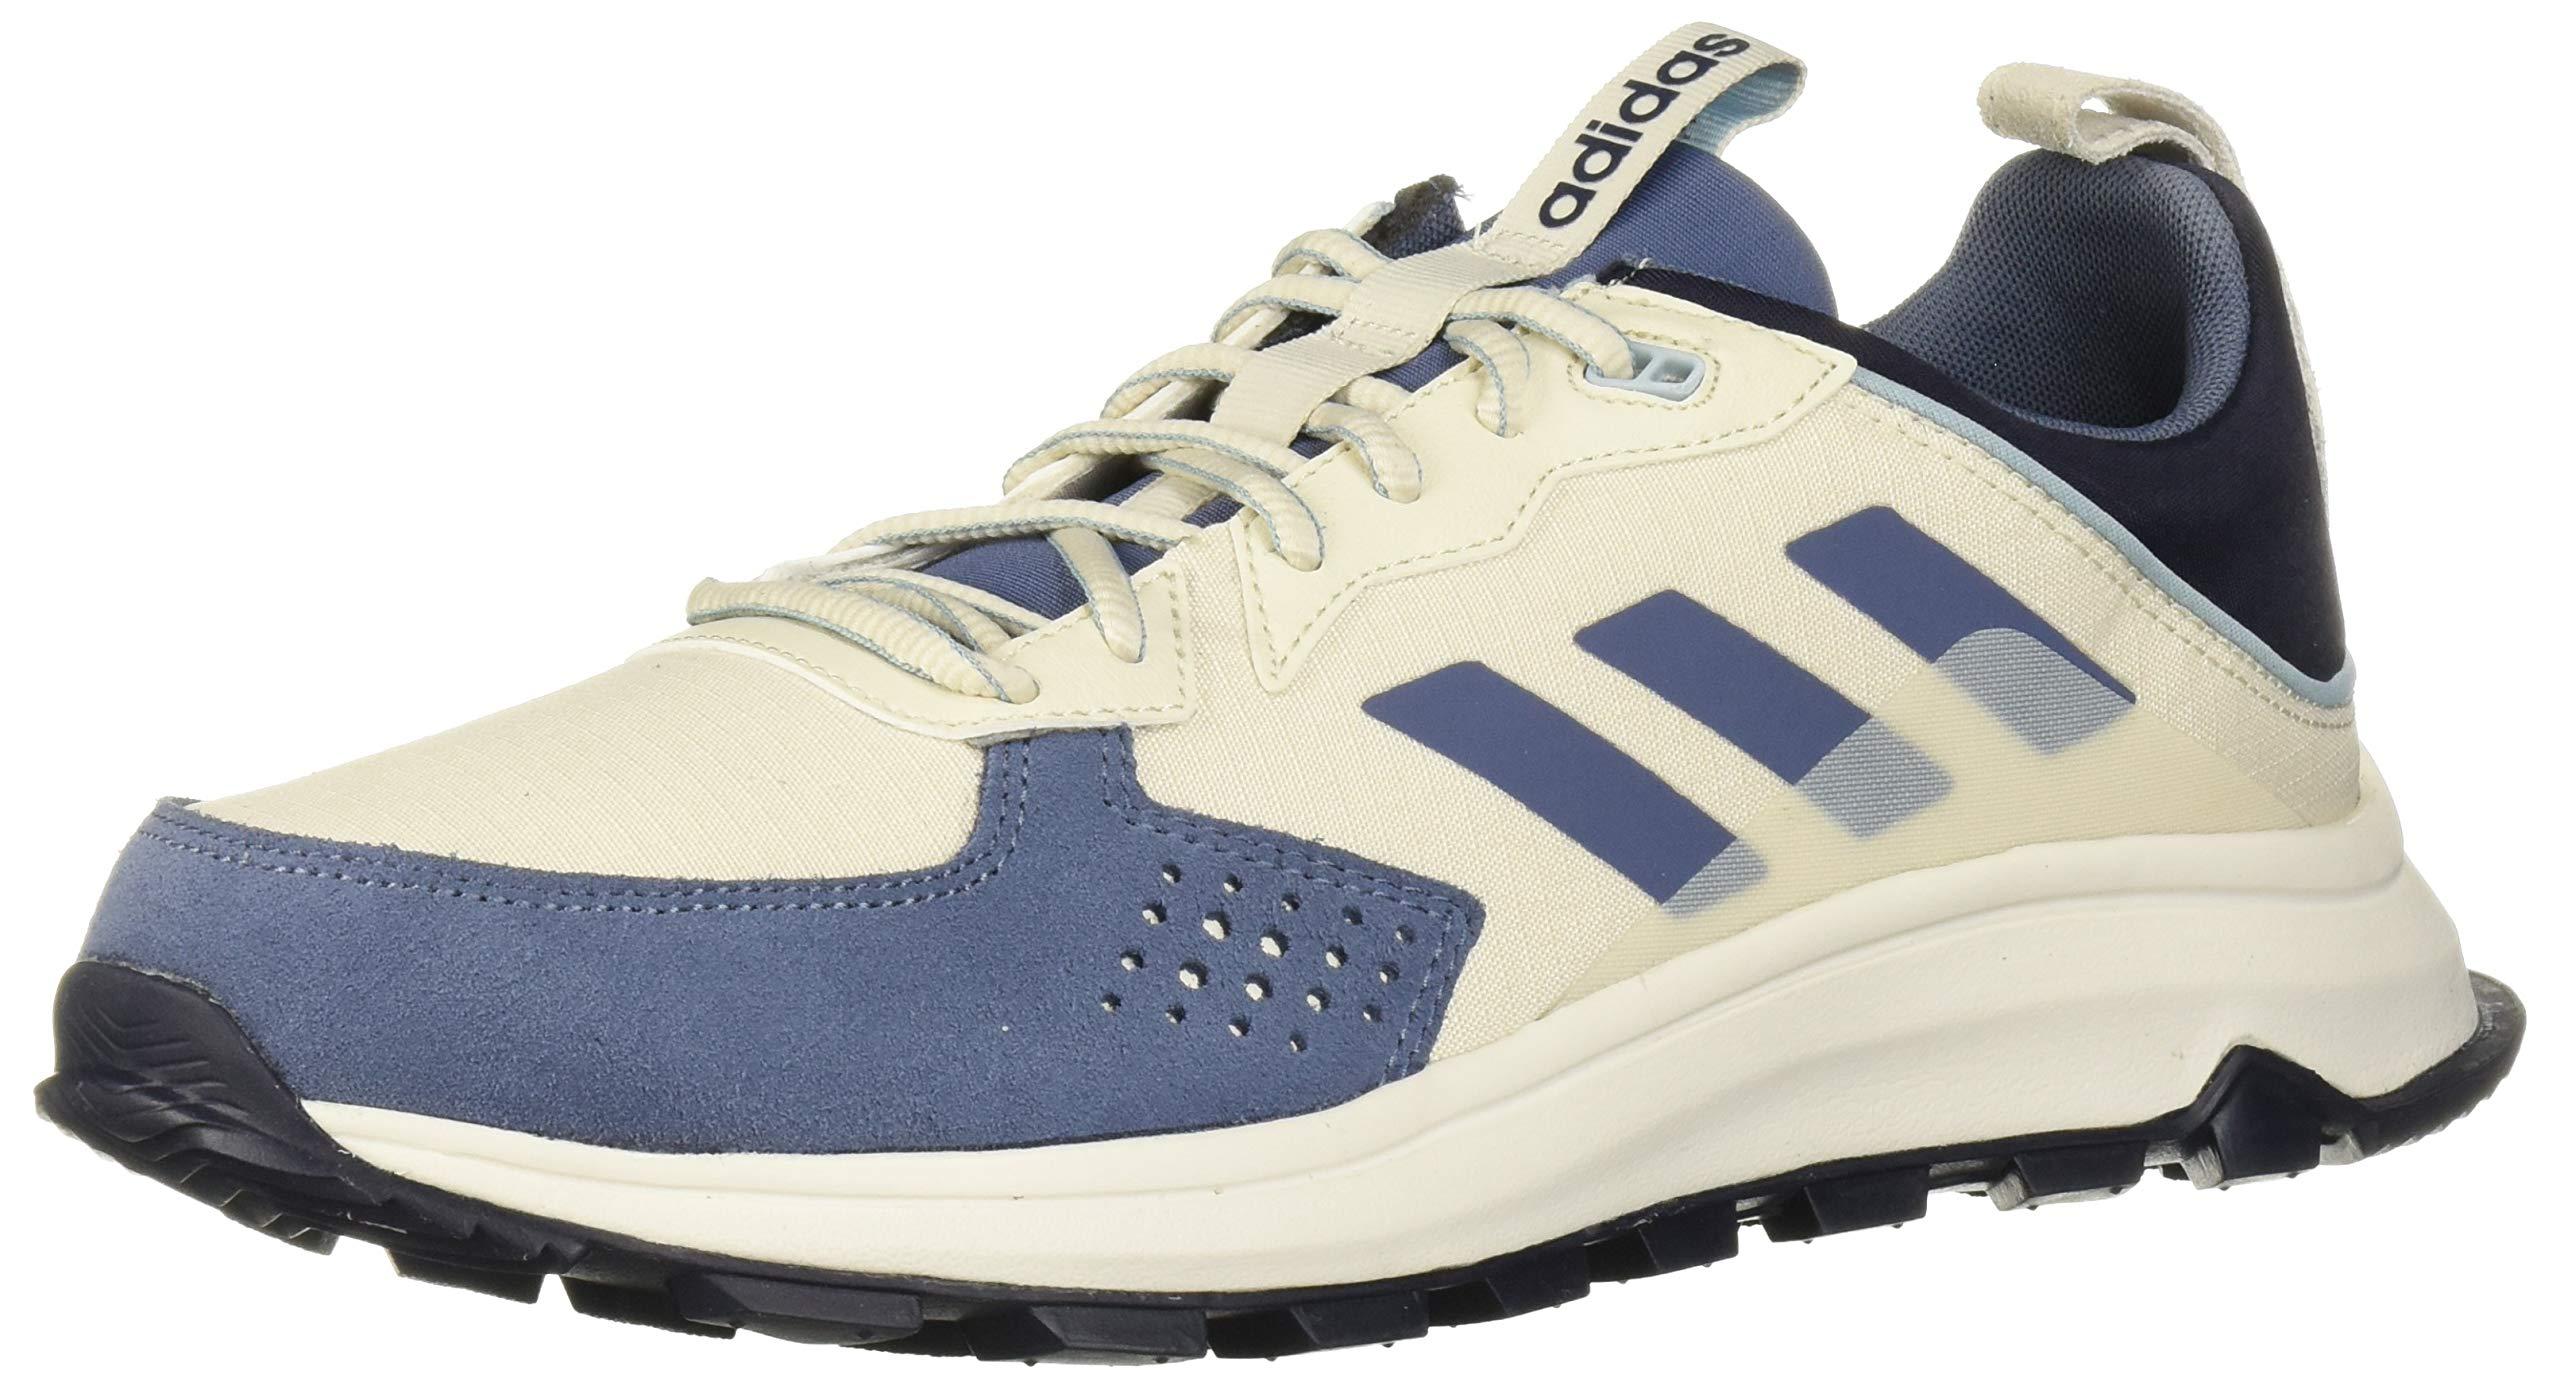 adidas Men's Response Trail Running Shoe, White/Tech Legend Ink, 11.5 Medium US by adidas